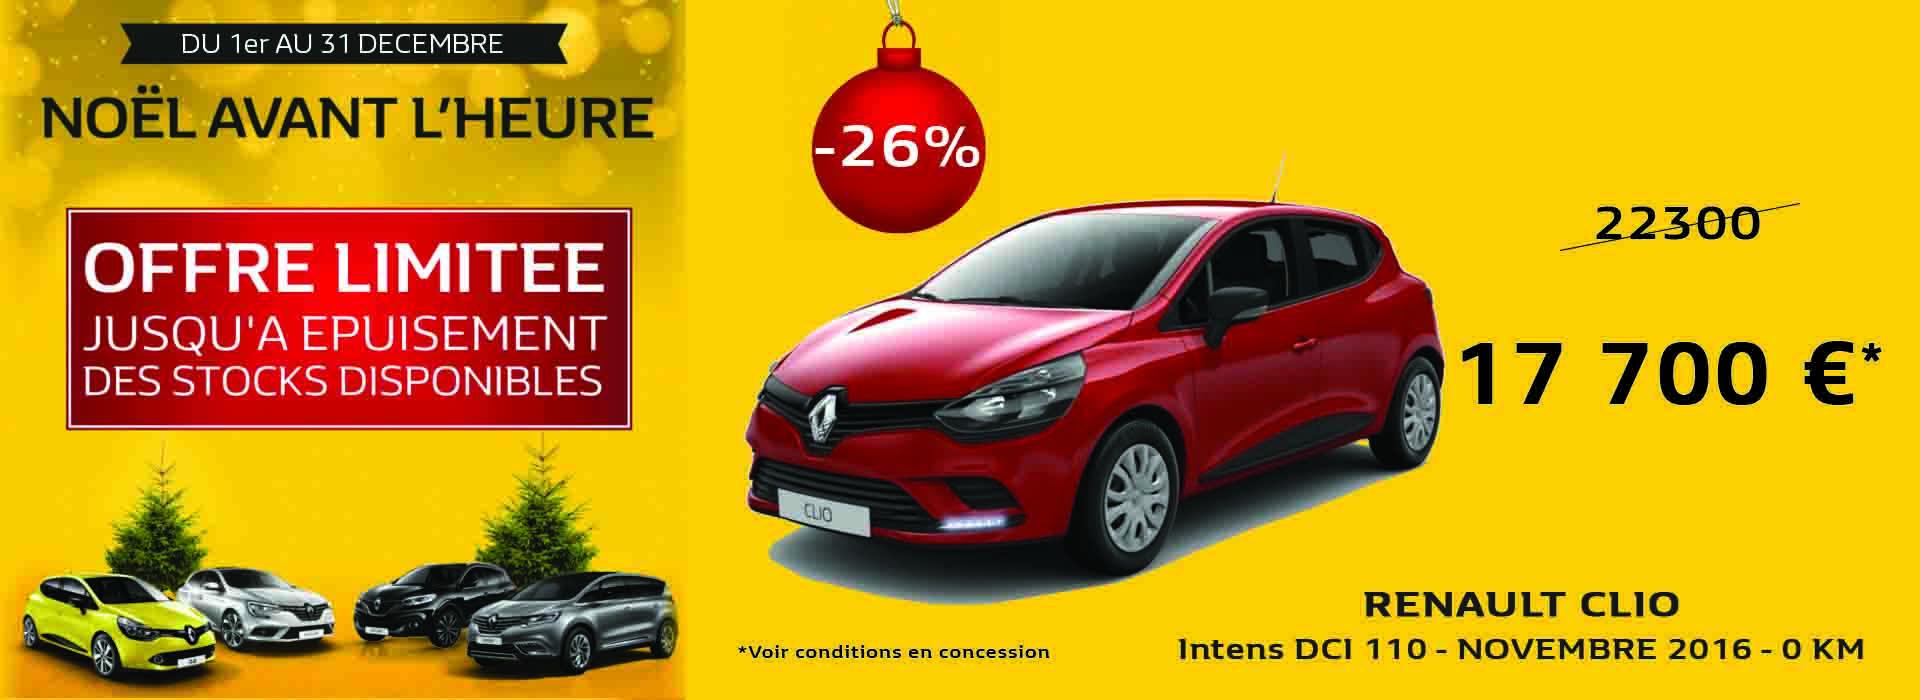 Renault occasion aix en provence renault megane dynamique for Garage renault aix en provence